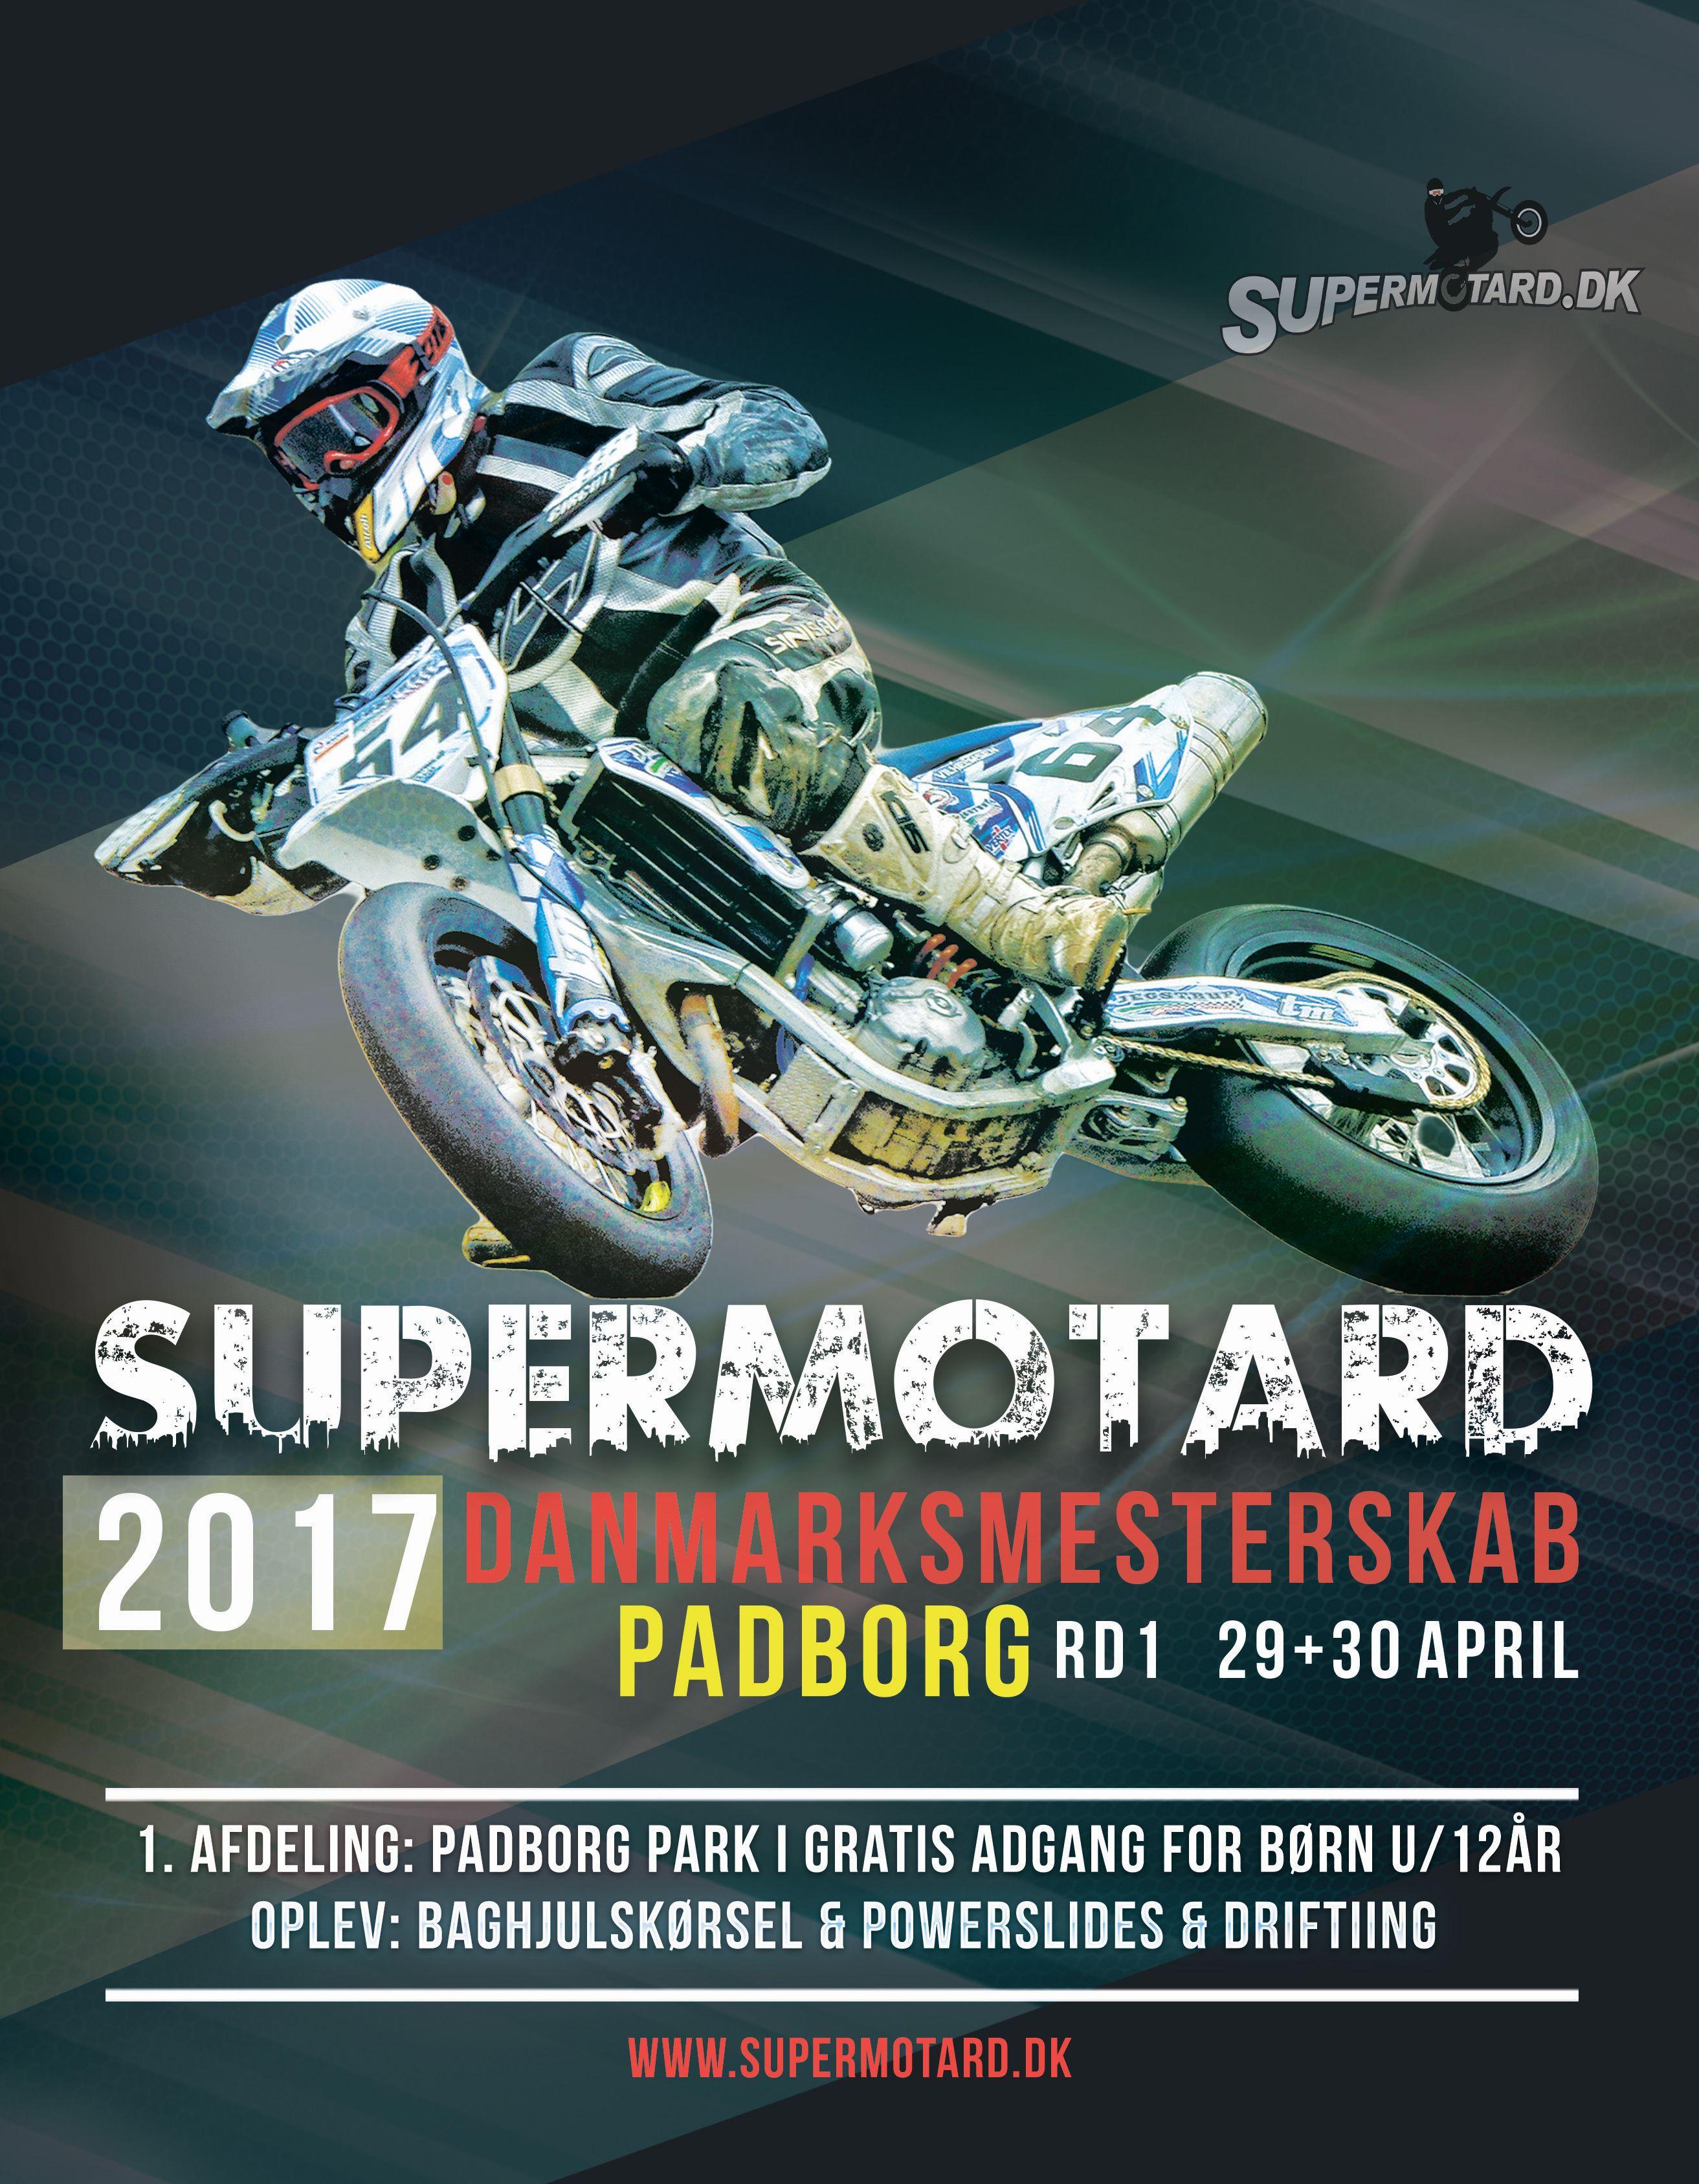 2017 Supermotard Danmarksmesterskab